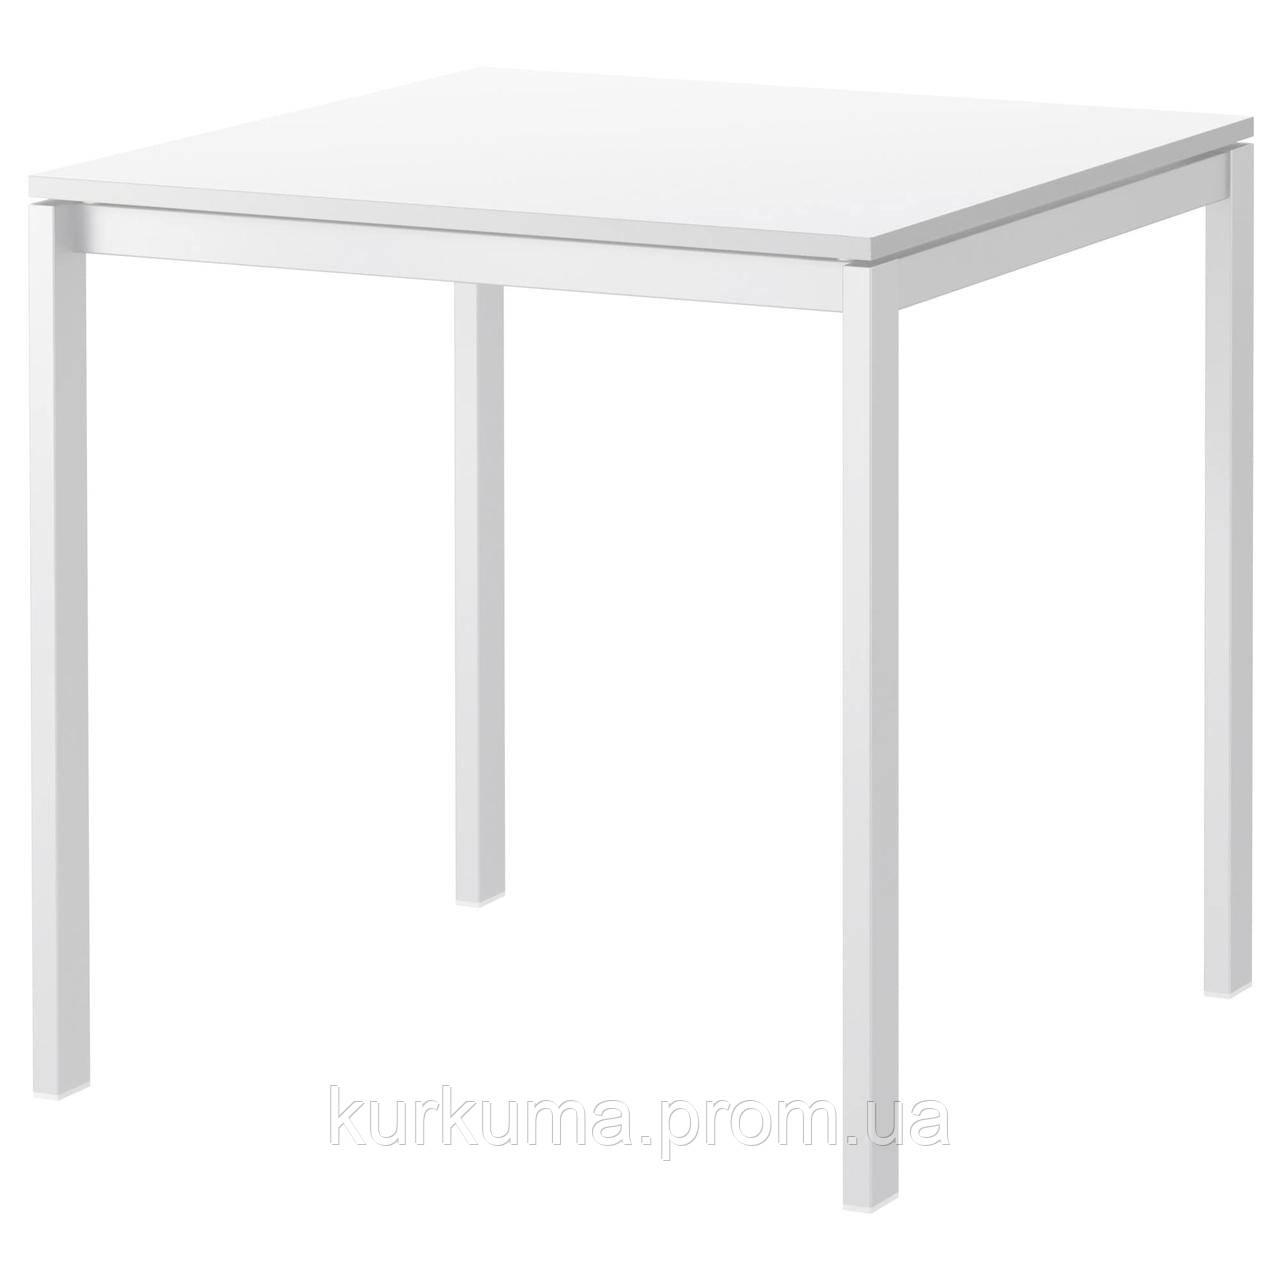 IKEA MELLTORP Стол, белый  (390.117.81)